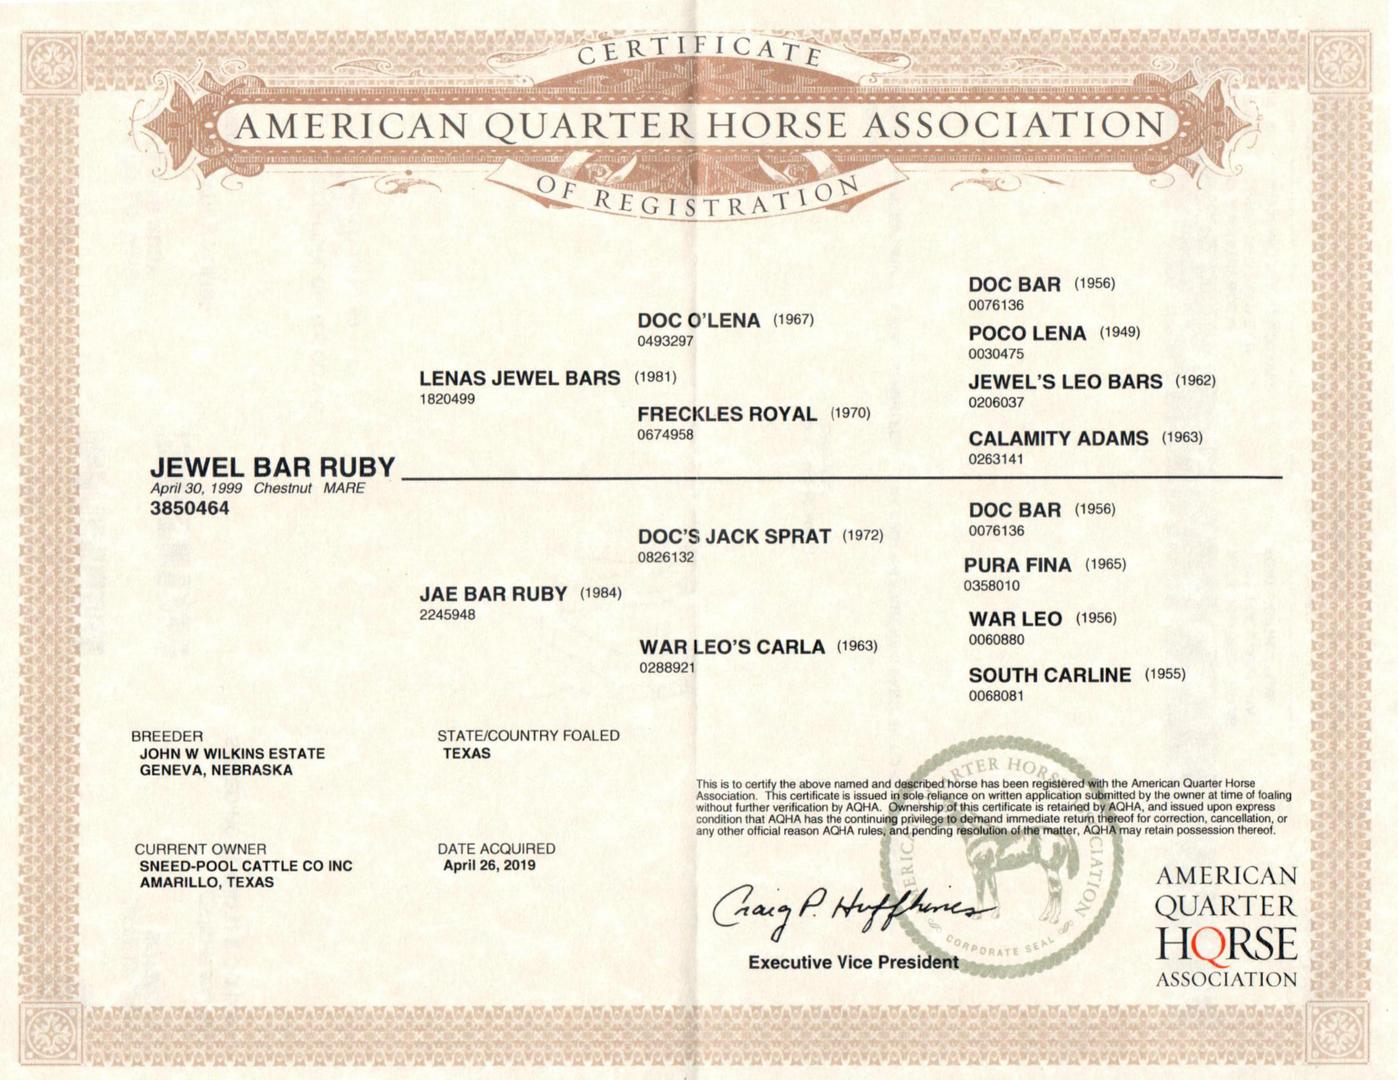 Jewel Bar Ruby AQHA certificate